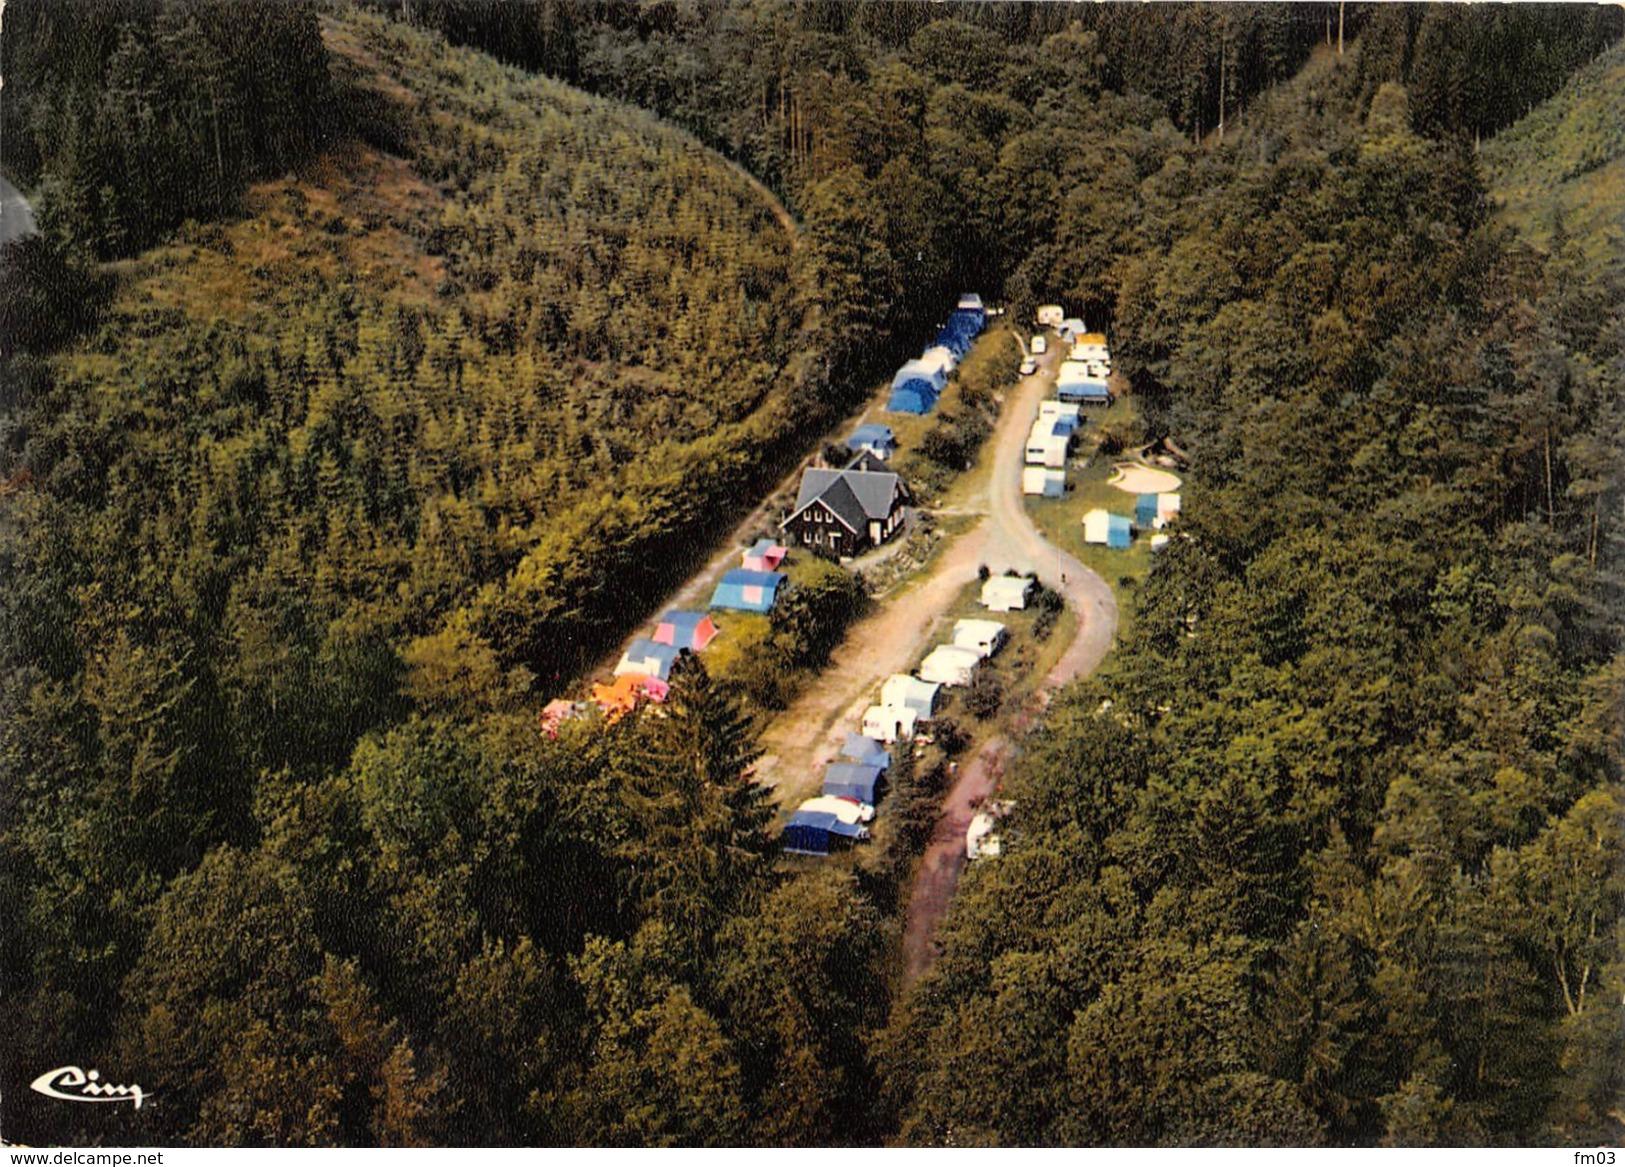 Chiny Camping - Chiny